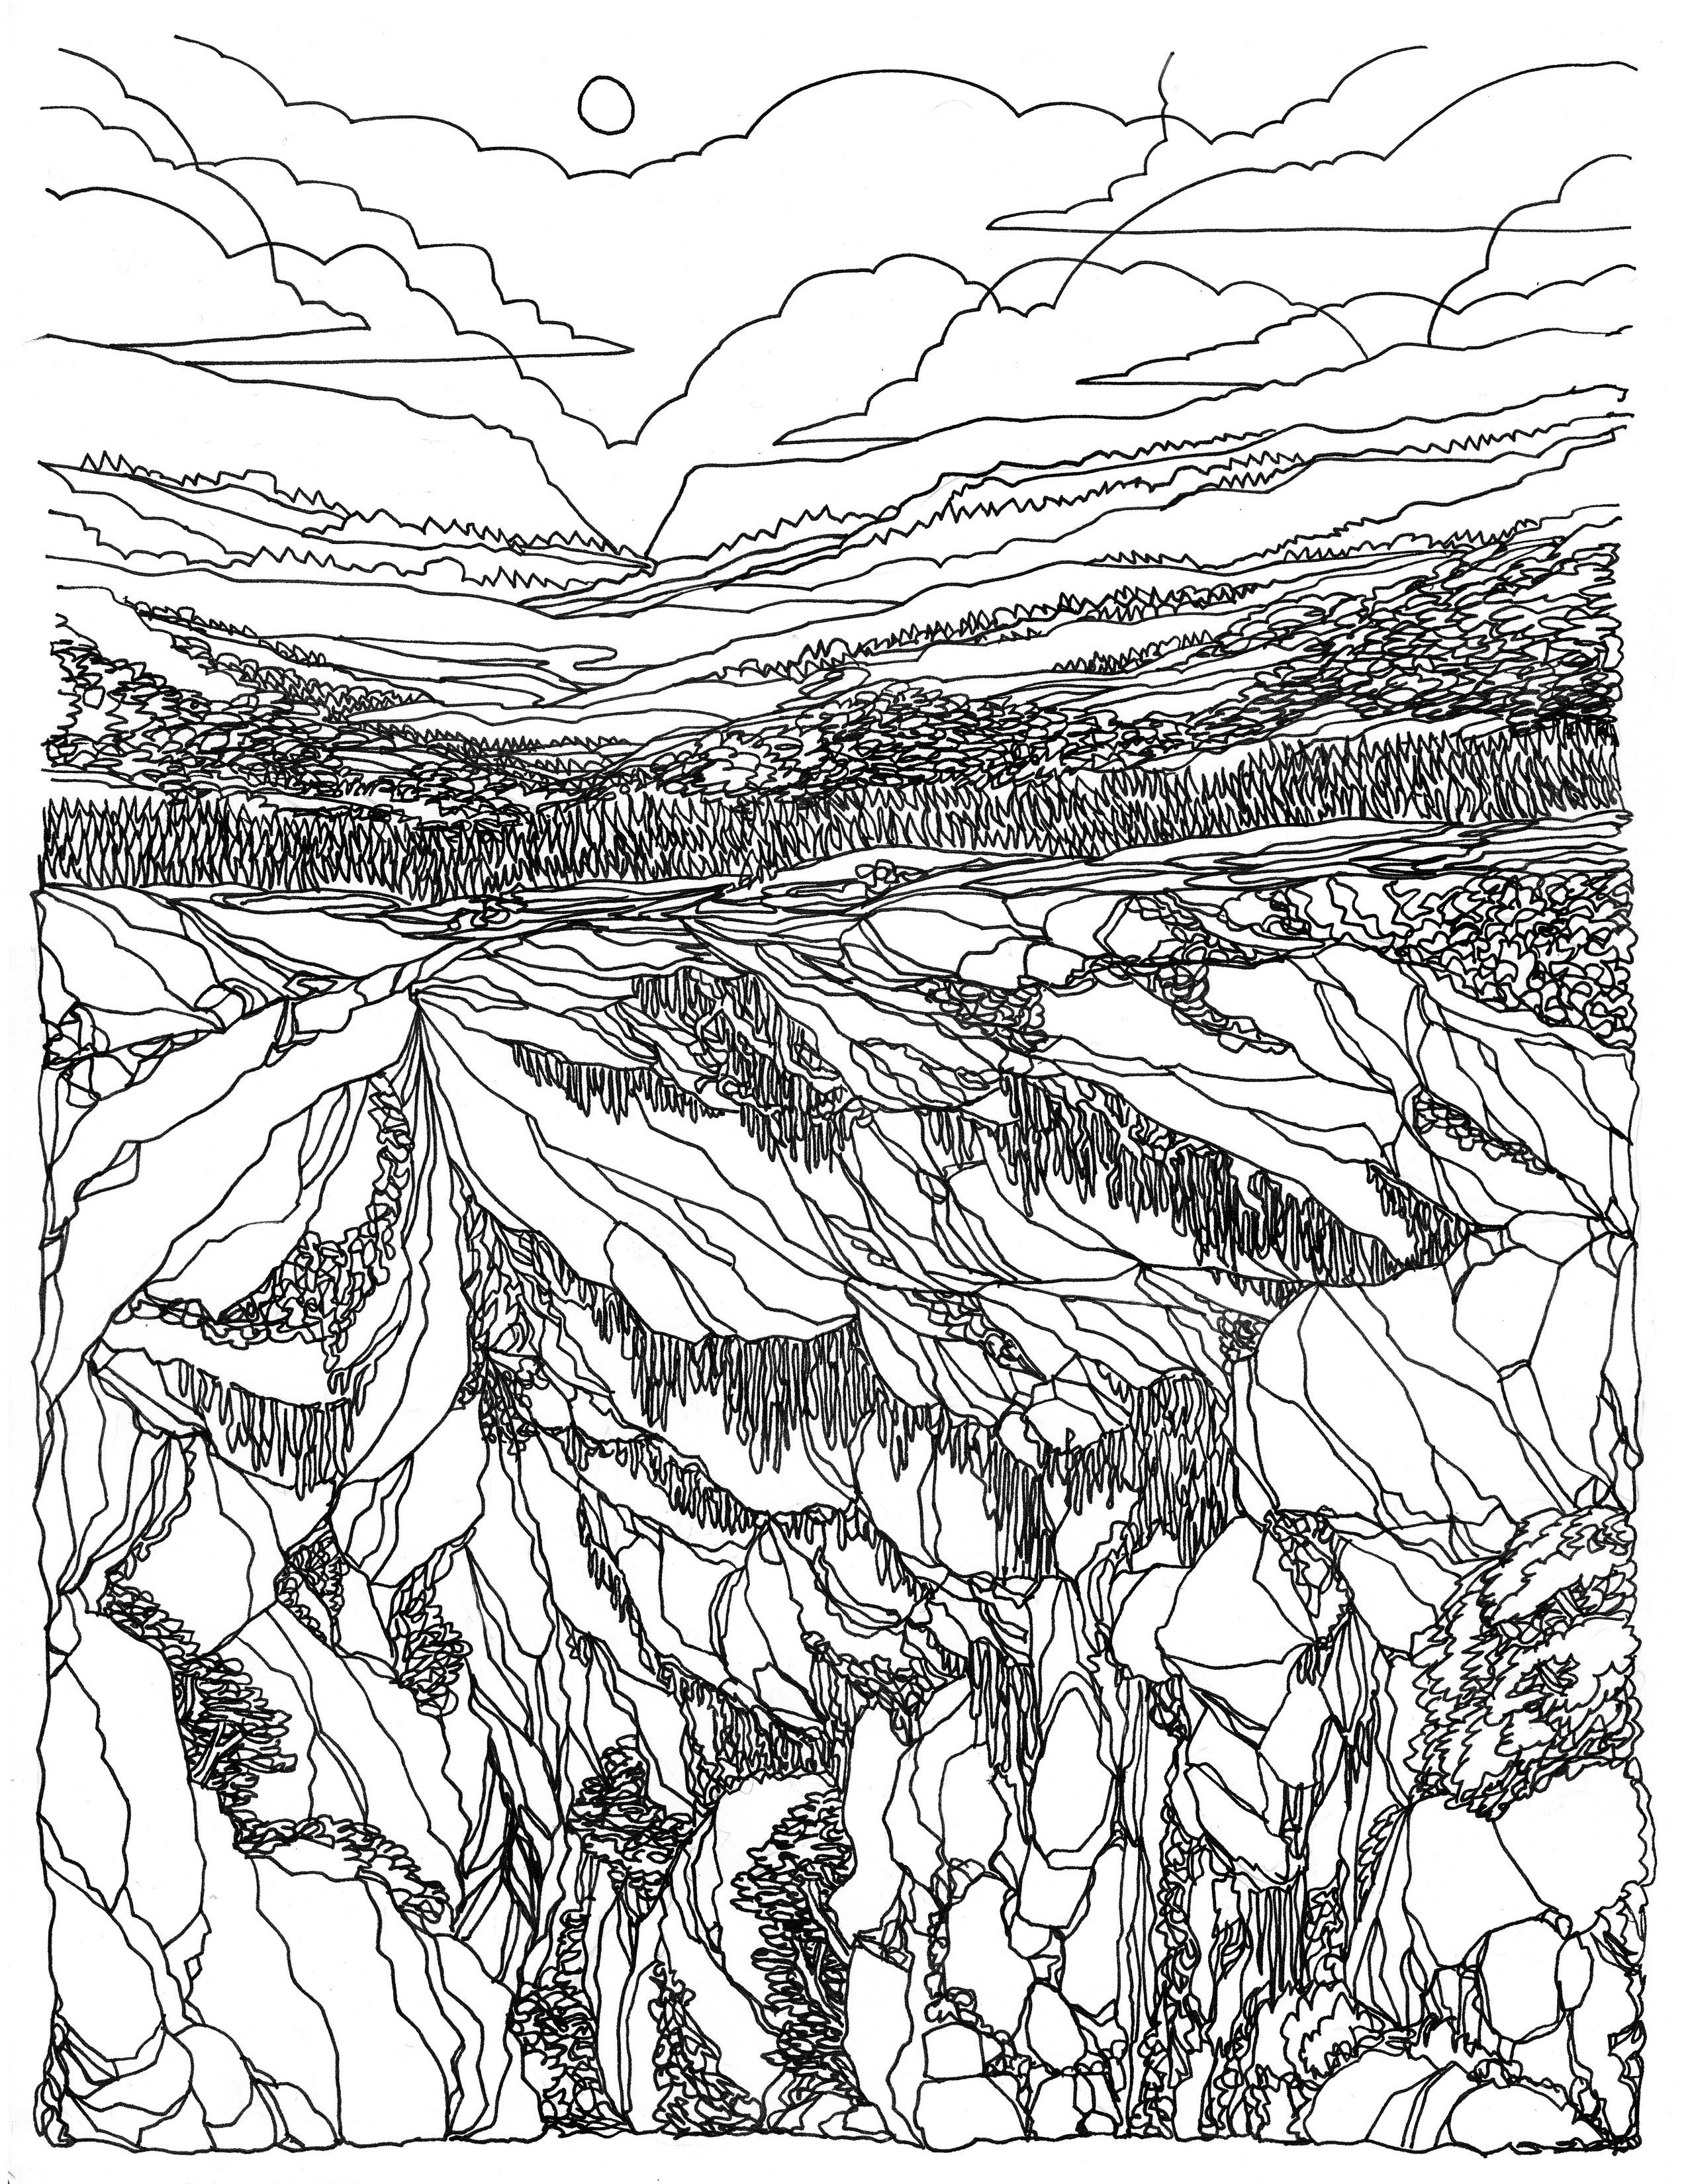 Paper Spaces No. 1 Image